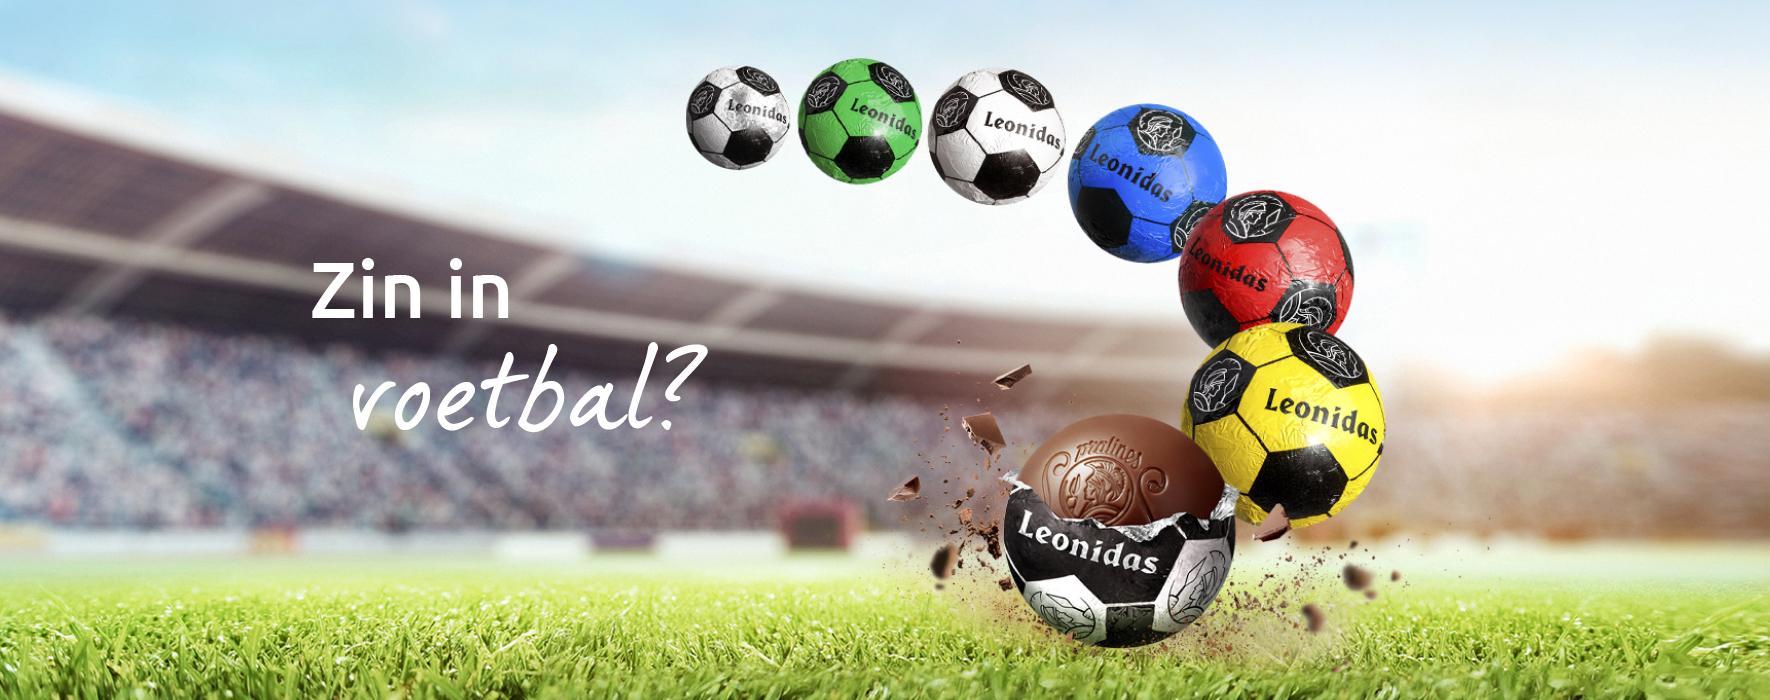 Leonidas Voetbal Assortiment | Snel Levering | LEONIDAS ONLINE